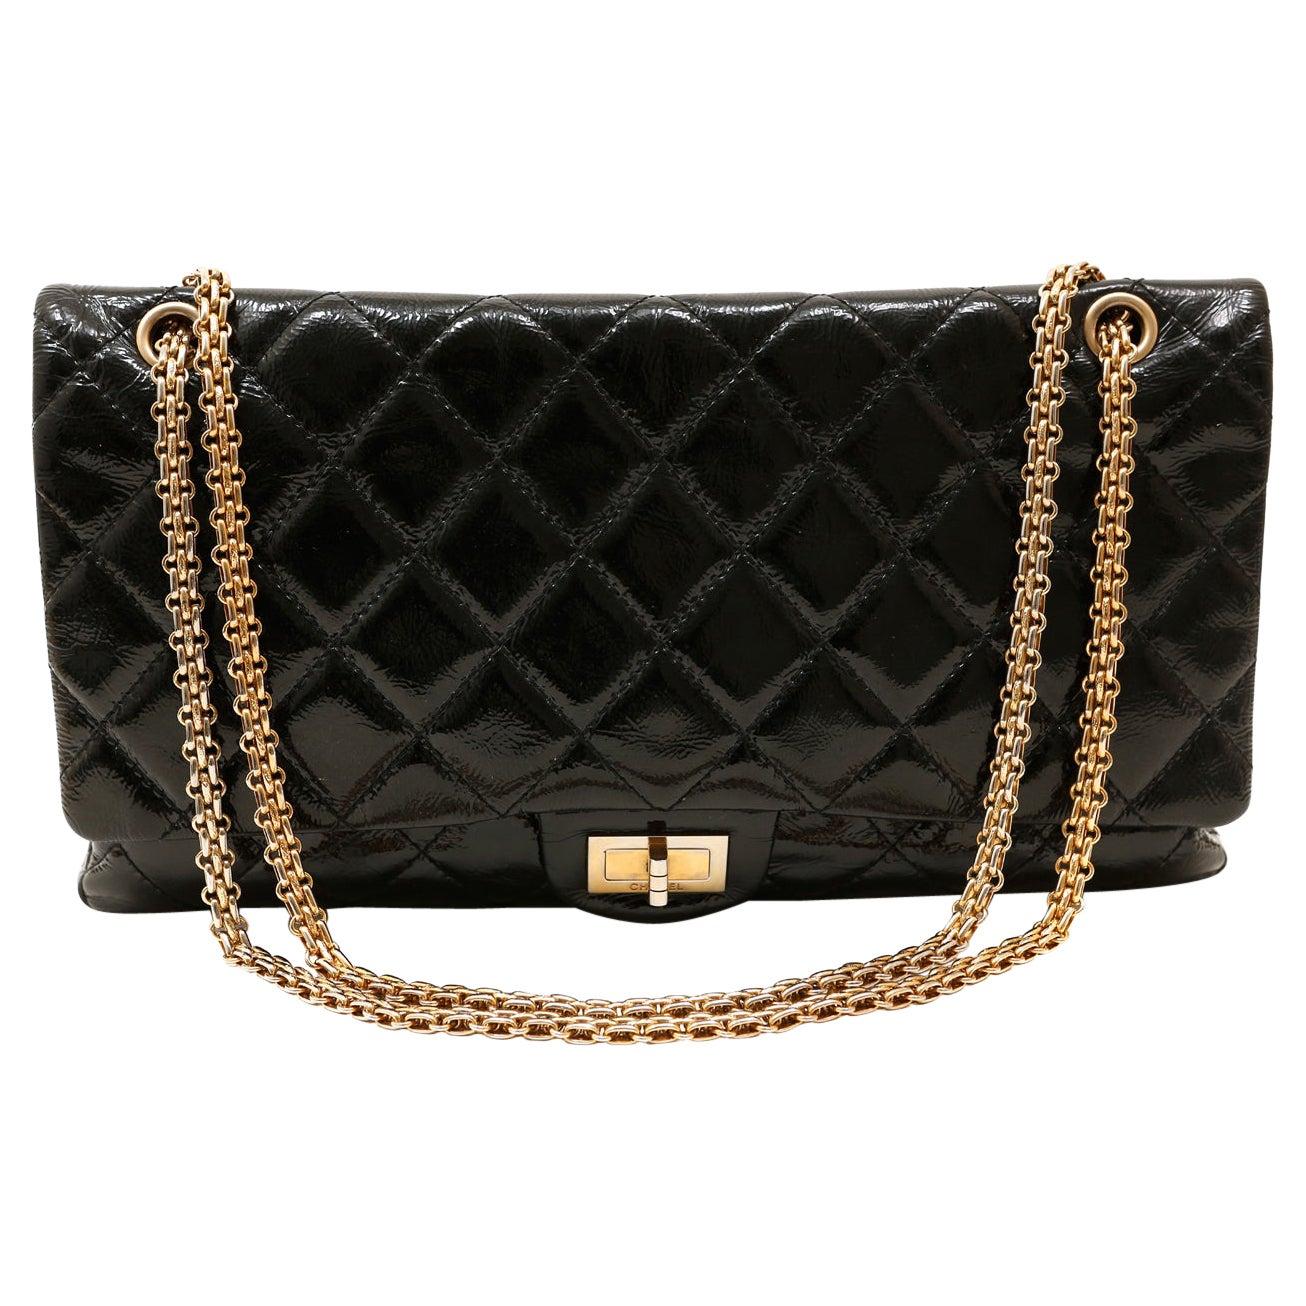 Chanel Black Patent Leather Reissue Maxi Flap Bag 228 size